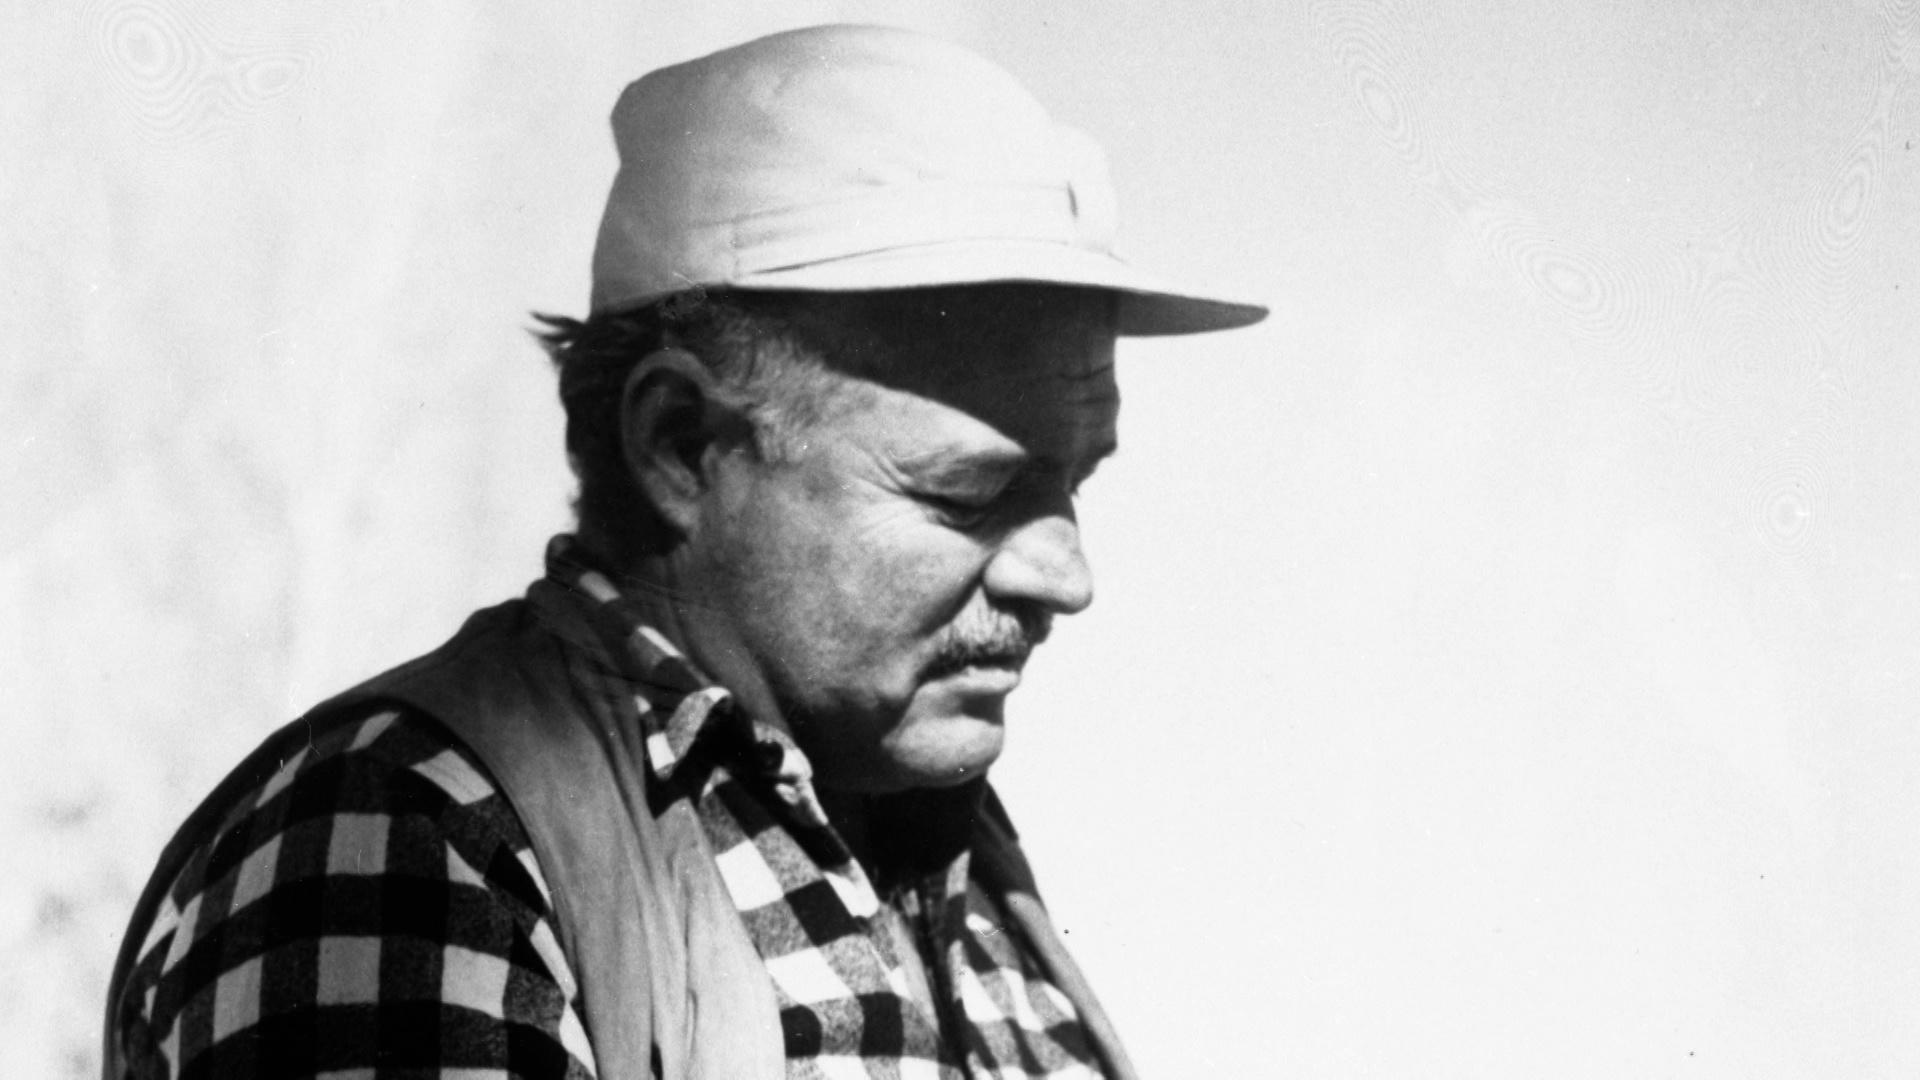 Short: Idaho's Hemingway